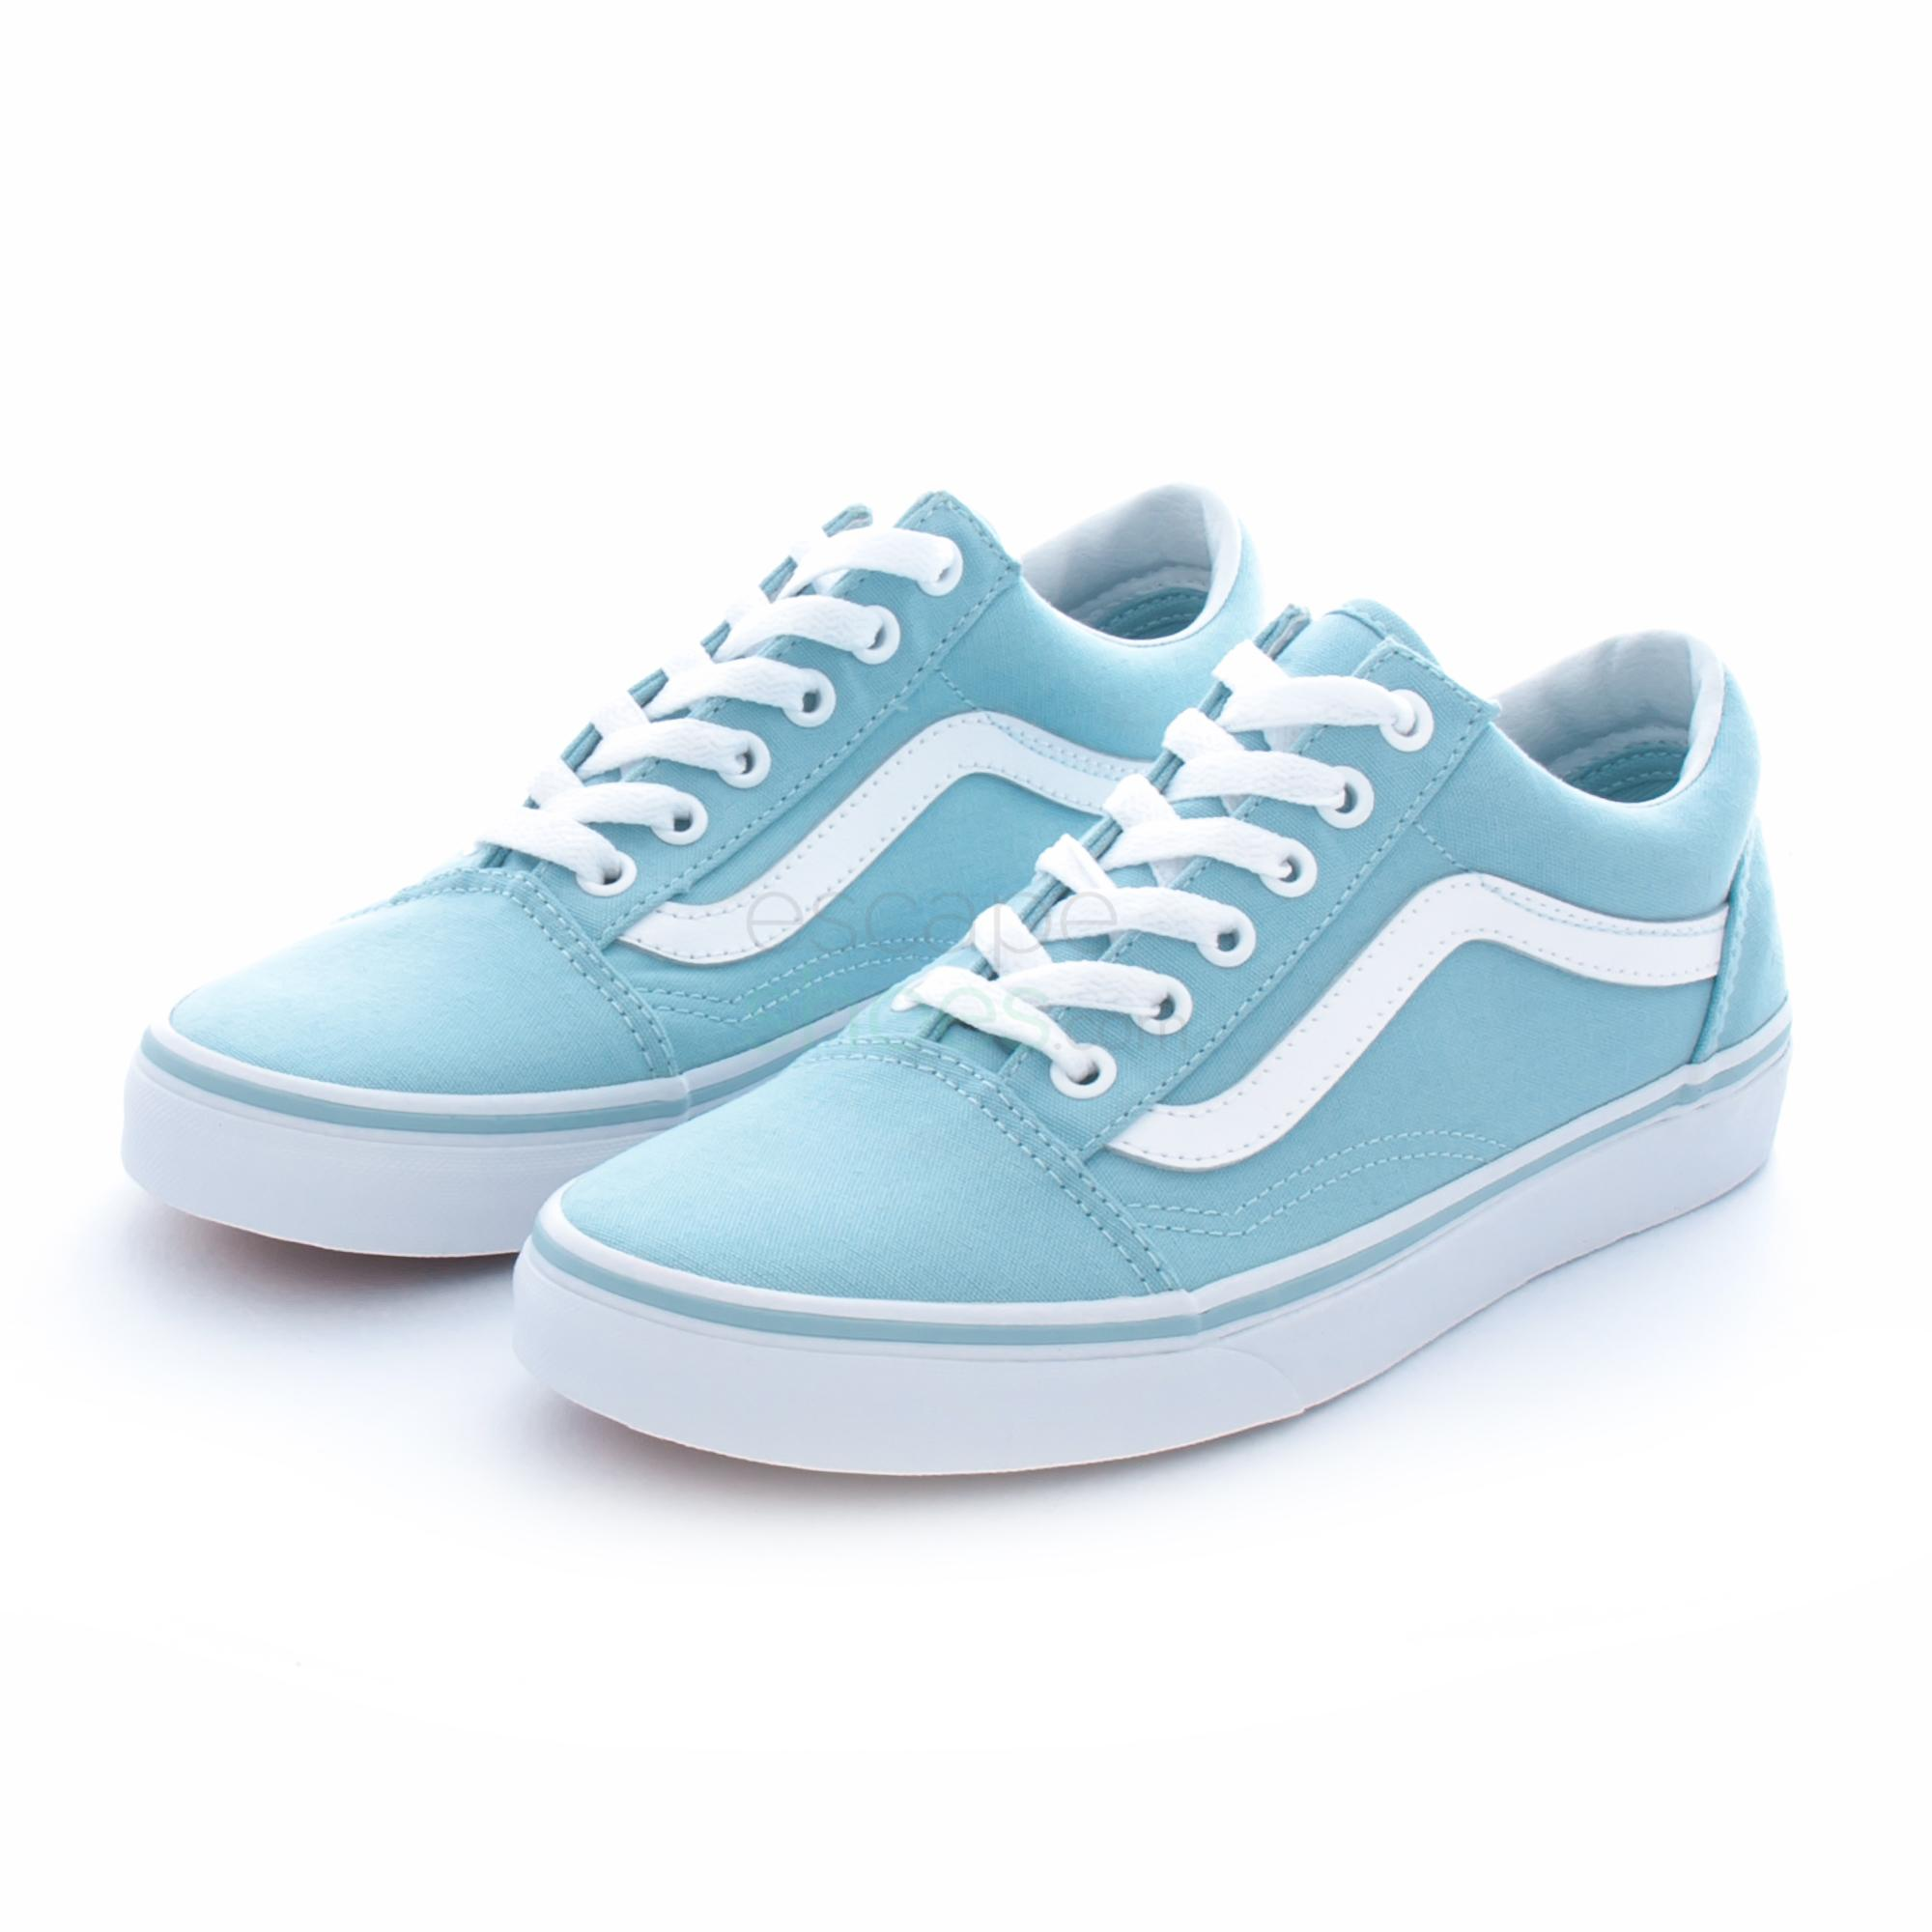 Buy your Sneakers VANS Old Skool Crystal Blue True White VA38G1MQW ... 5c217e39316